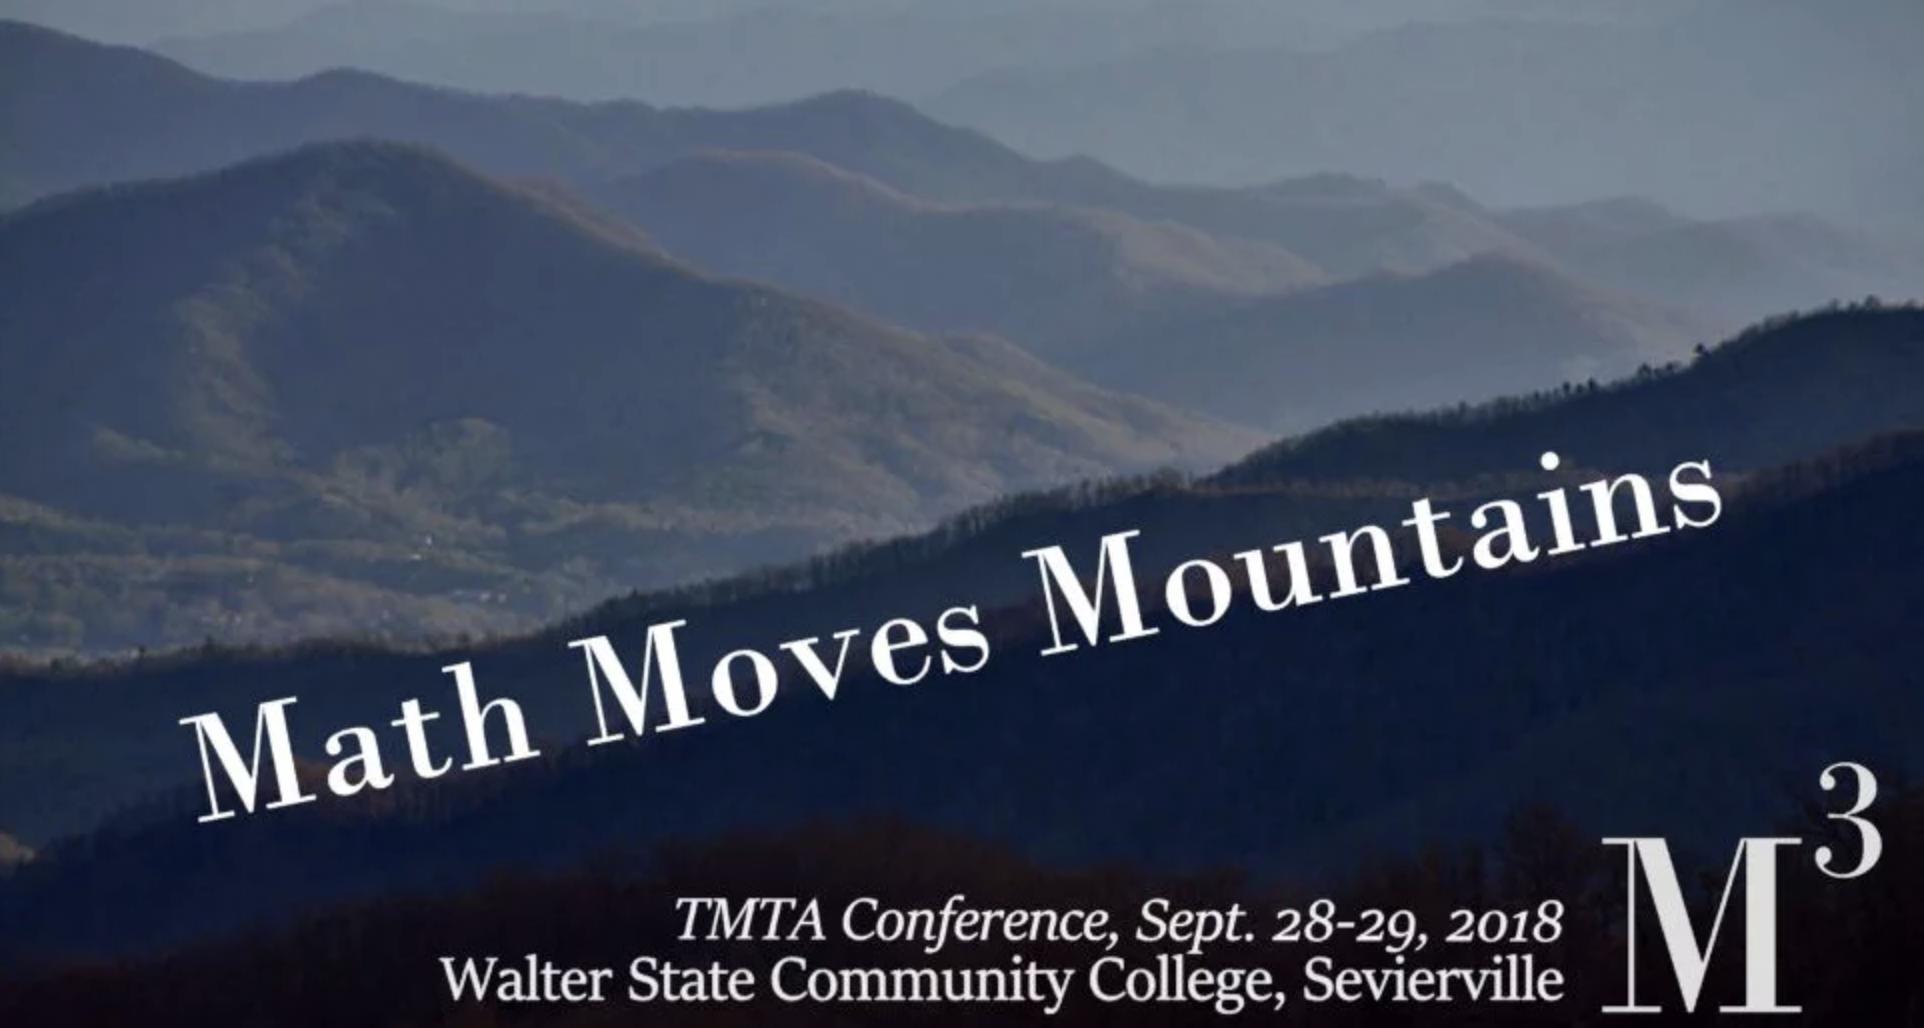 2018 TMTA Conference